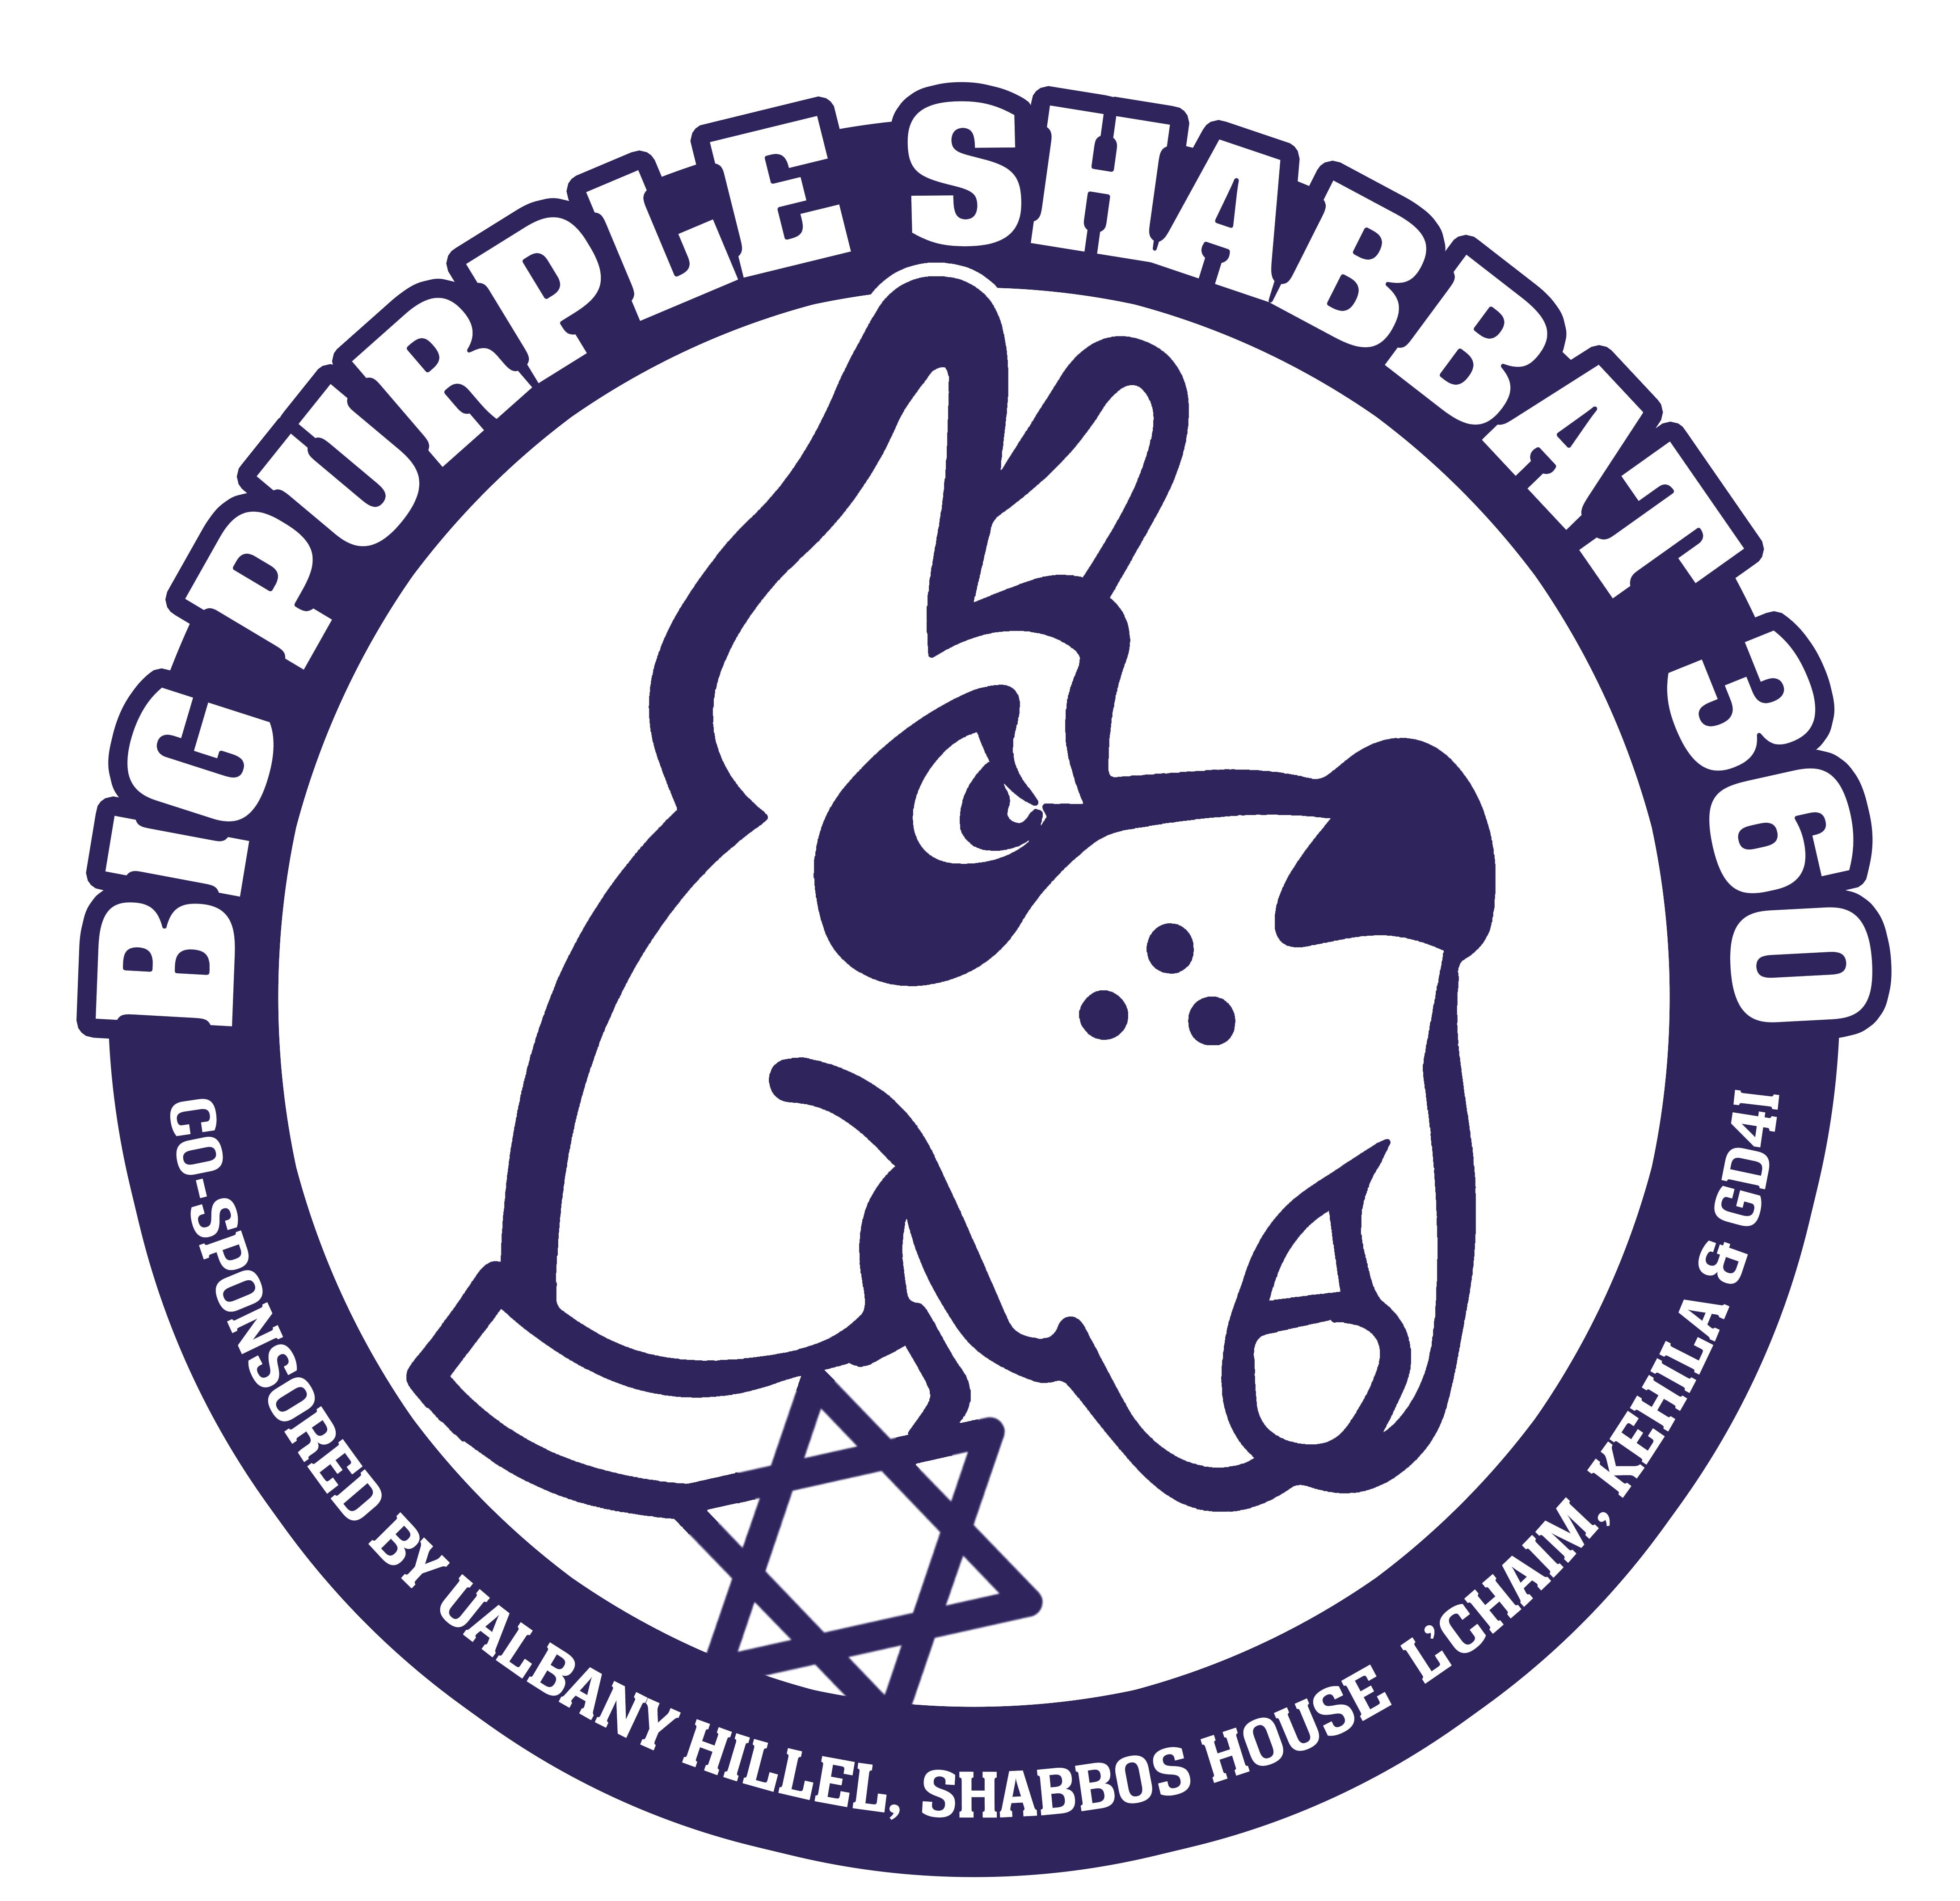 Shabbos House » Shabbat 360 2019 at UAlbany